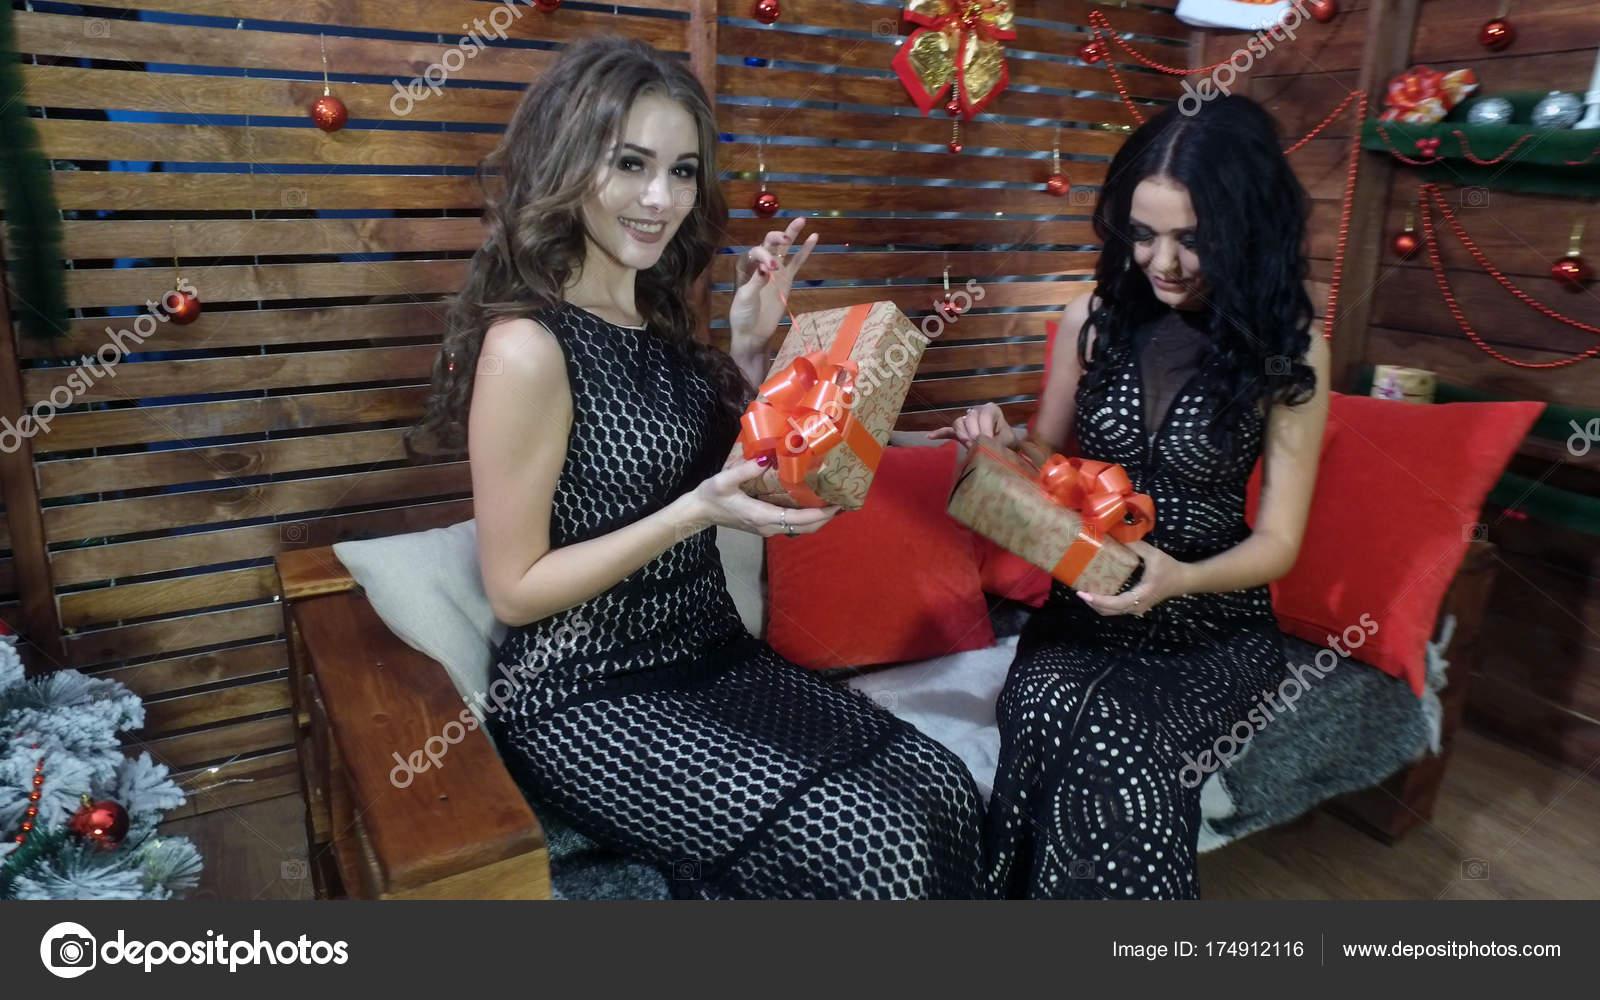 1a79fc809384 Δύο όμορφα κορίτσια σε μαύρα φορέματα με γιορτινά κουτιά στα χέρια τους–  εικόνα αρχείου